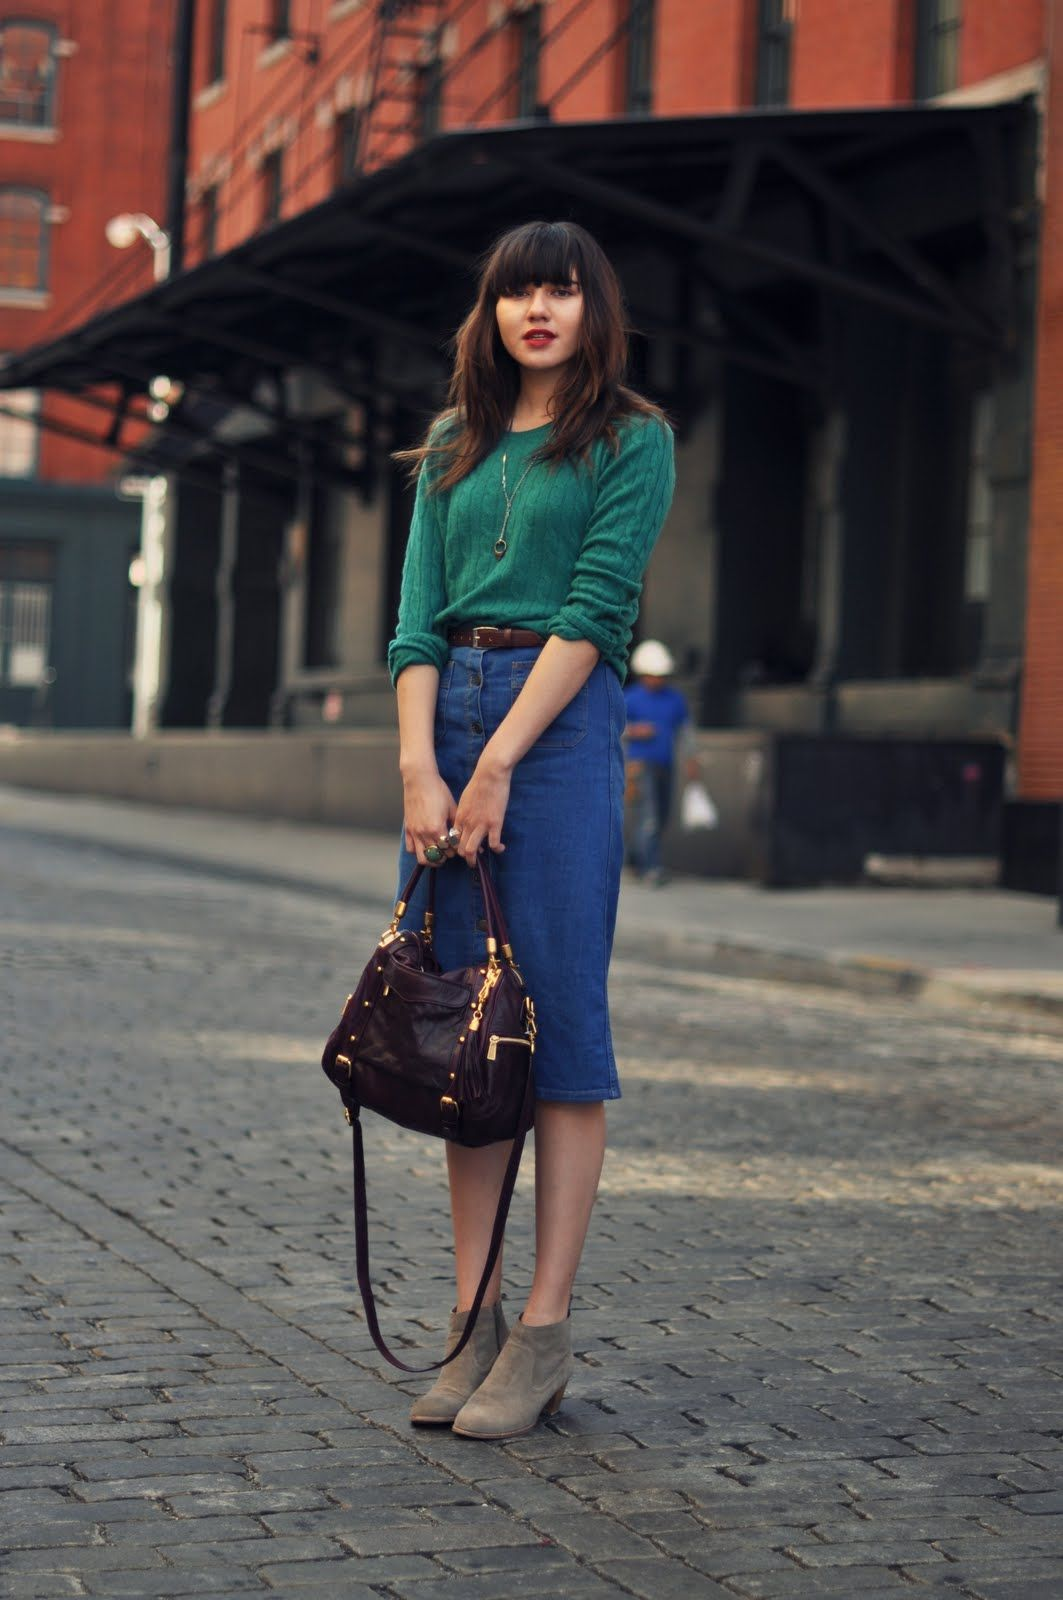 53d6330e0e0 Green sweater with denim skirt and tan boots. Cute cute cute. ♥